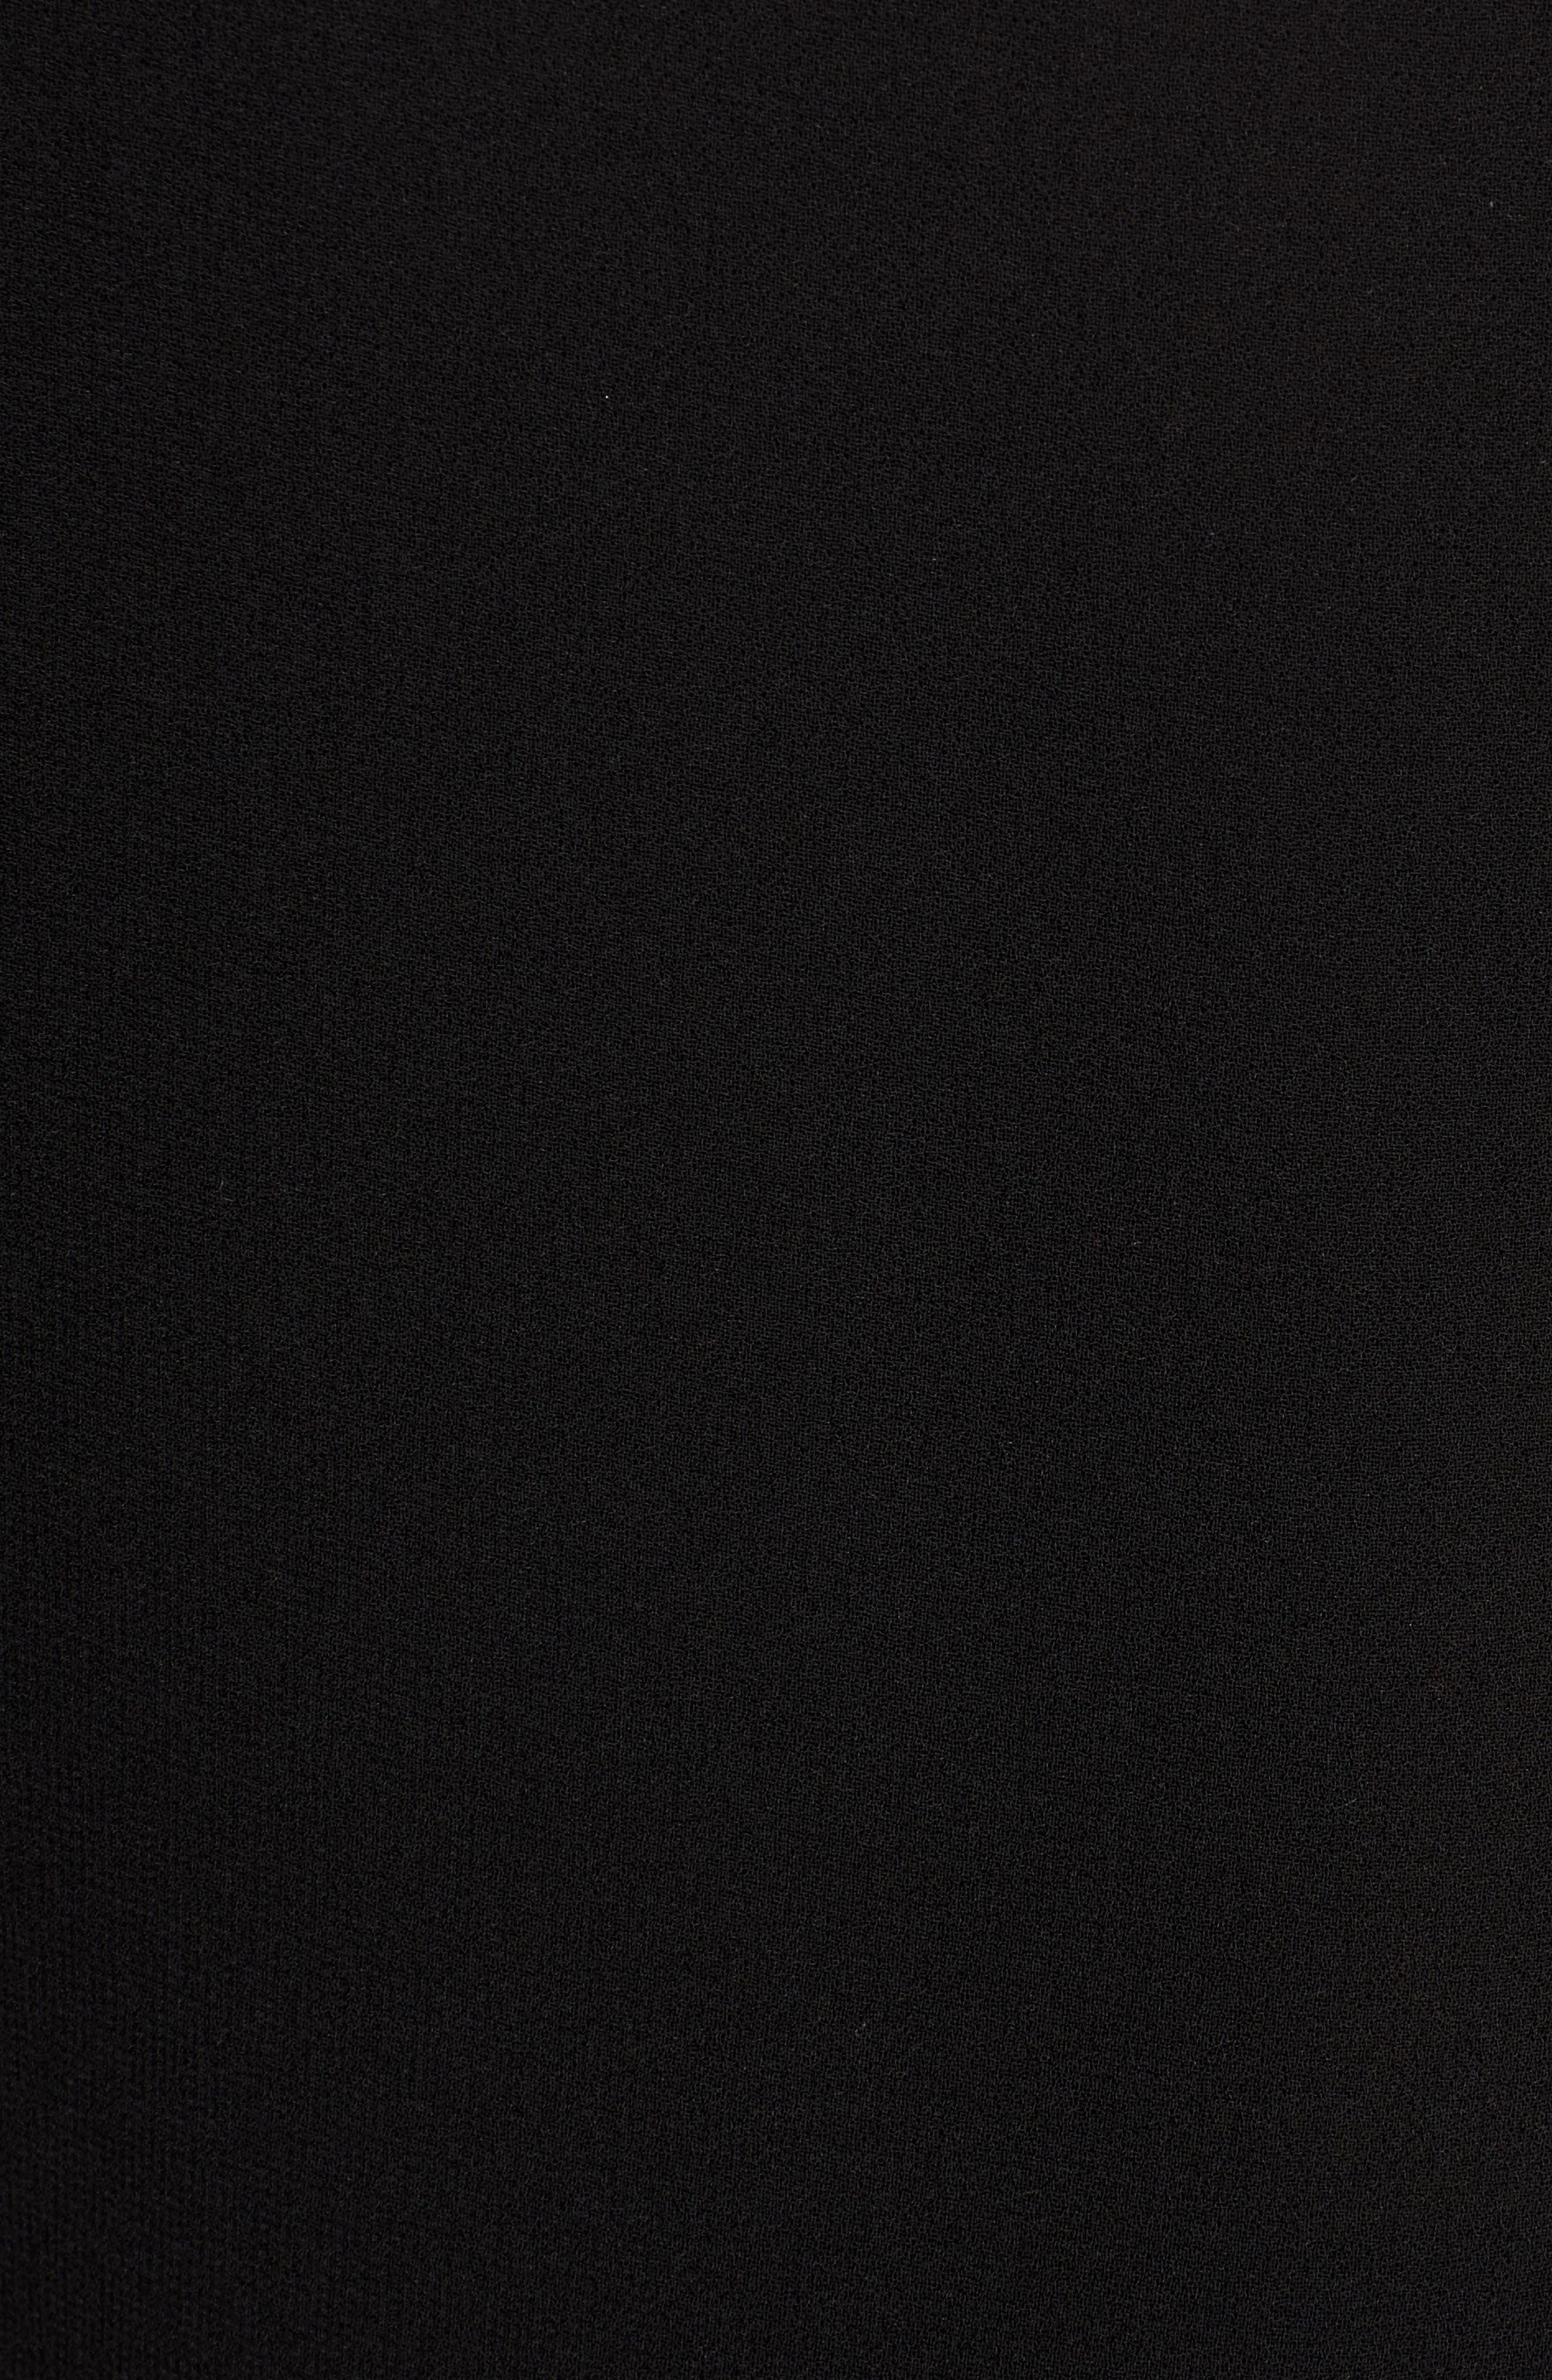 ANNE KLEIN,                             Double Layer Top,                             Alternate thumbnail 5, color,                             ANNE BLACK